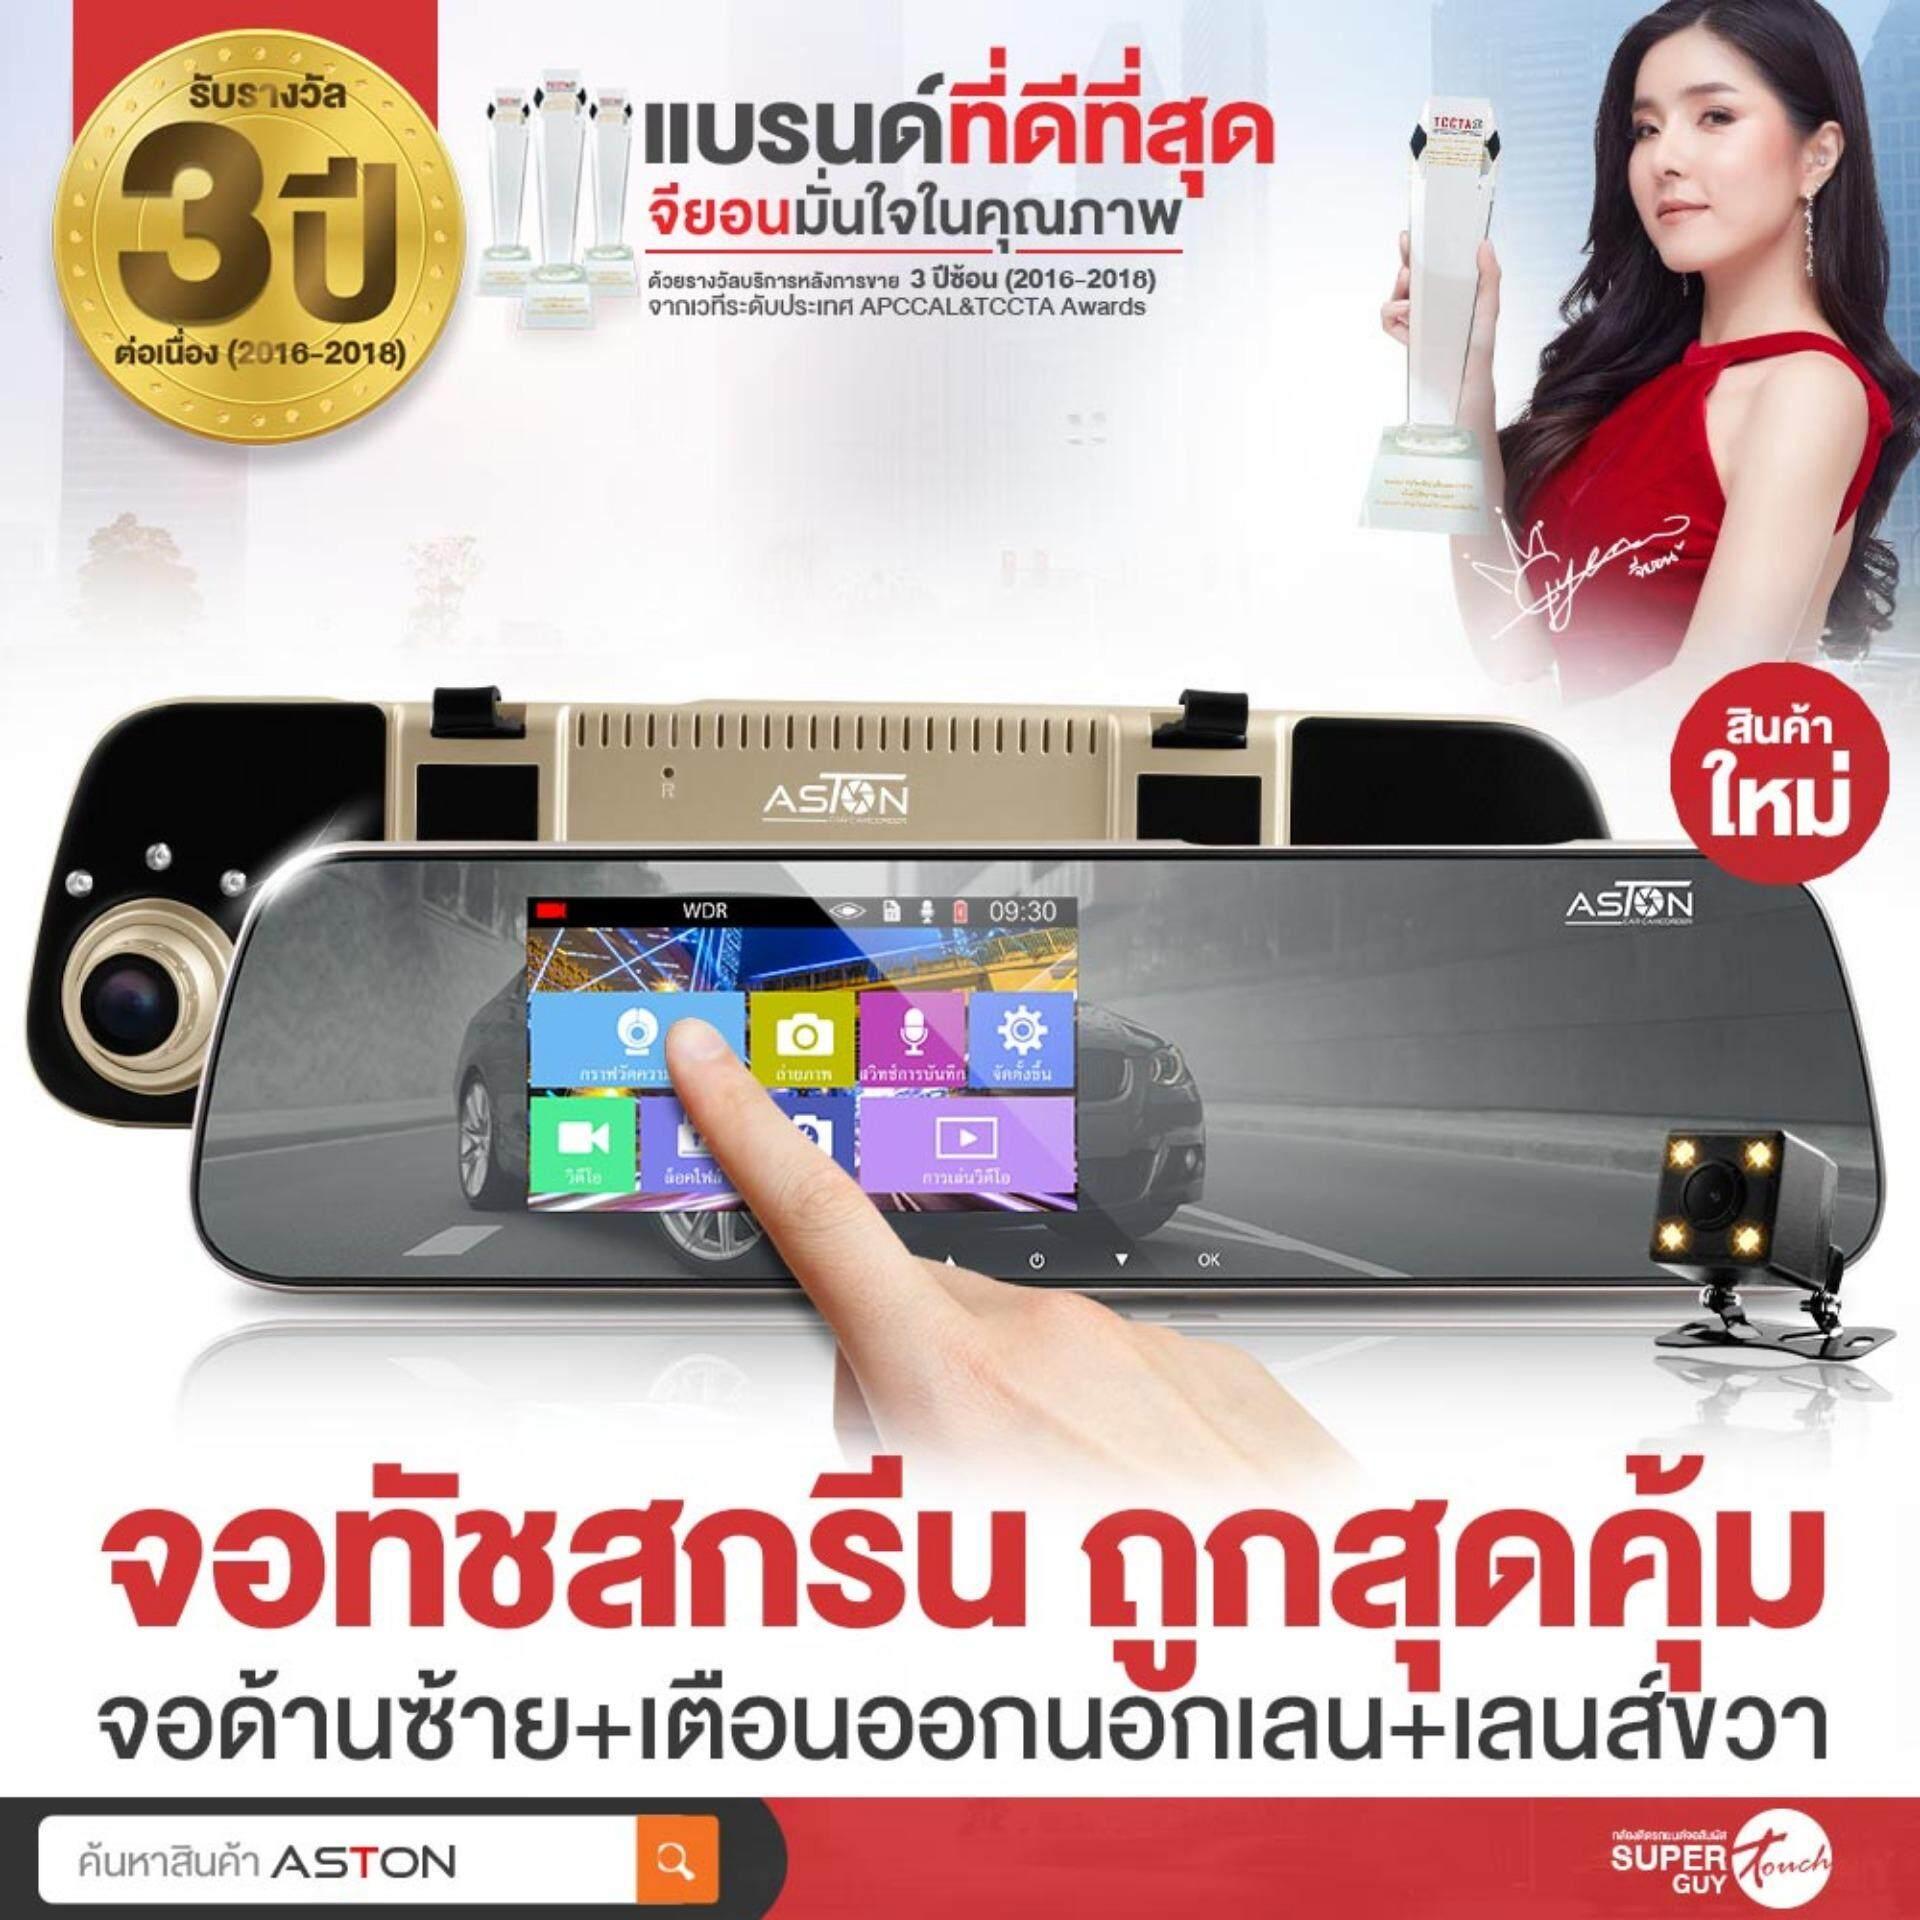 ASTON Super Touch Guy คุ้มสุดในทศวรรษ เจ้าแรก! และเจ้าเดียว บันทึก 2 กล้อง ที่มีจอสัมผัสอัจฉริยะด้านซาย เตือนออกนอกเลน และเลนส์กล้องด้านขวา คมชัดระดับ Full HD มีอินฟาเรด 5 ดวง คุ้มค่าที่สุดในไทย!